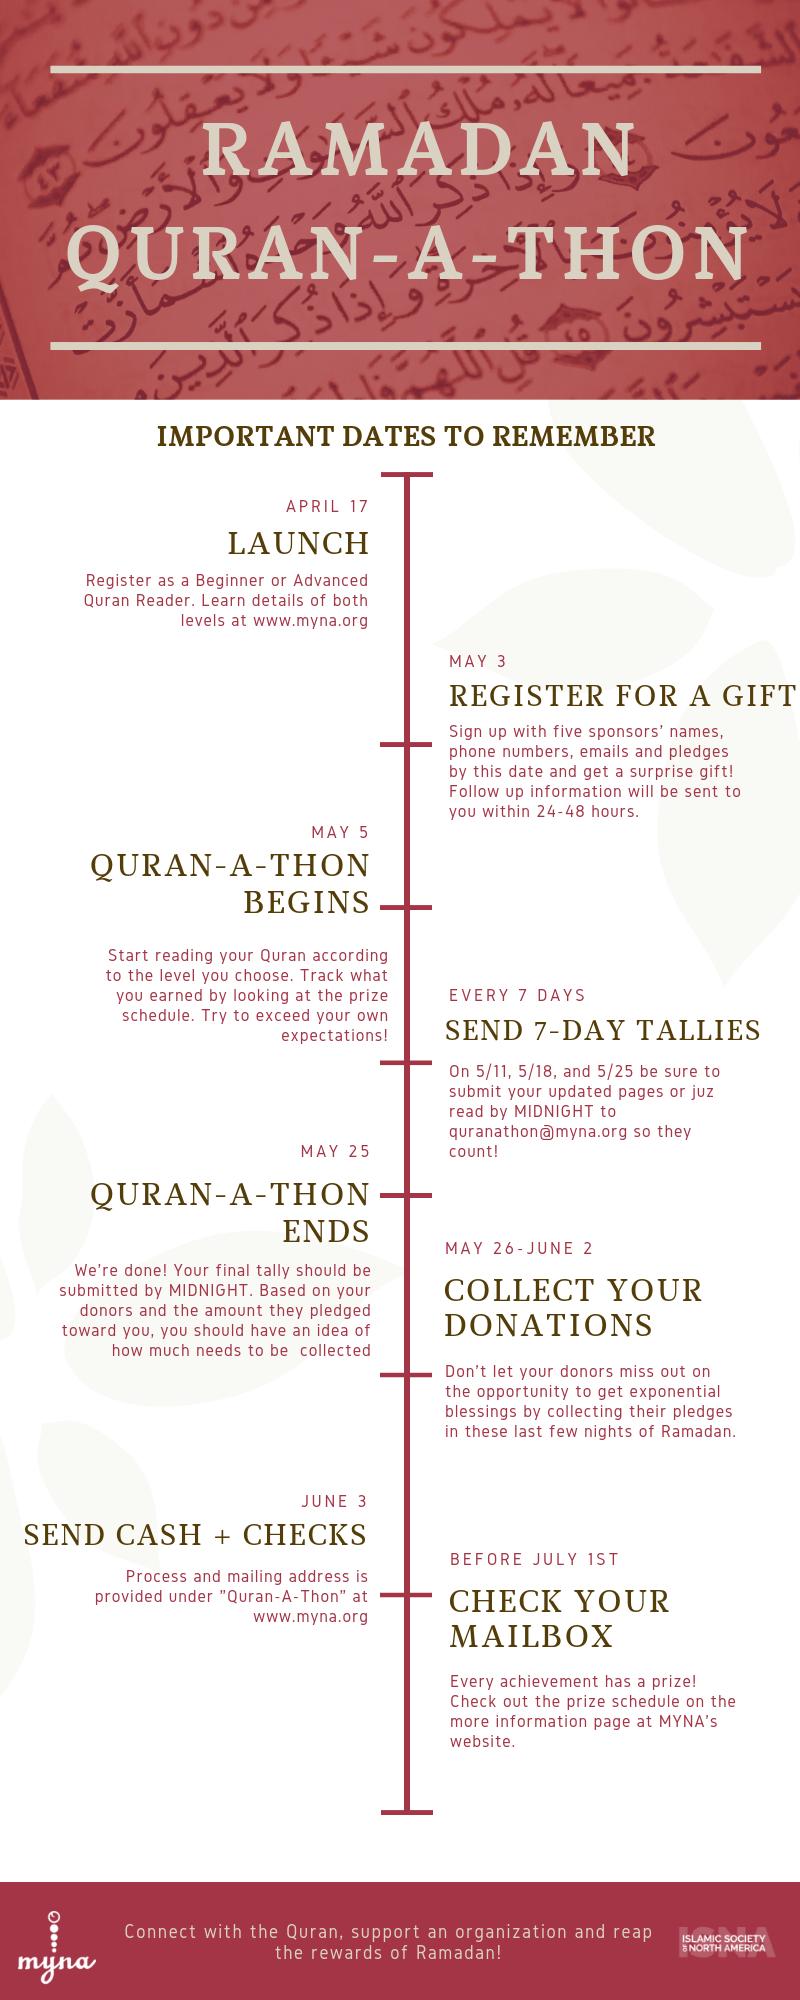 myna quran-a-thon timeline (2).png